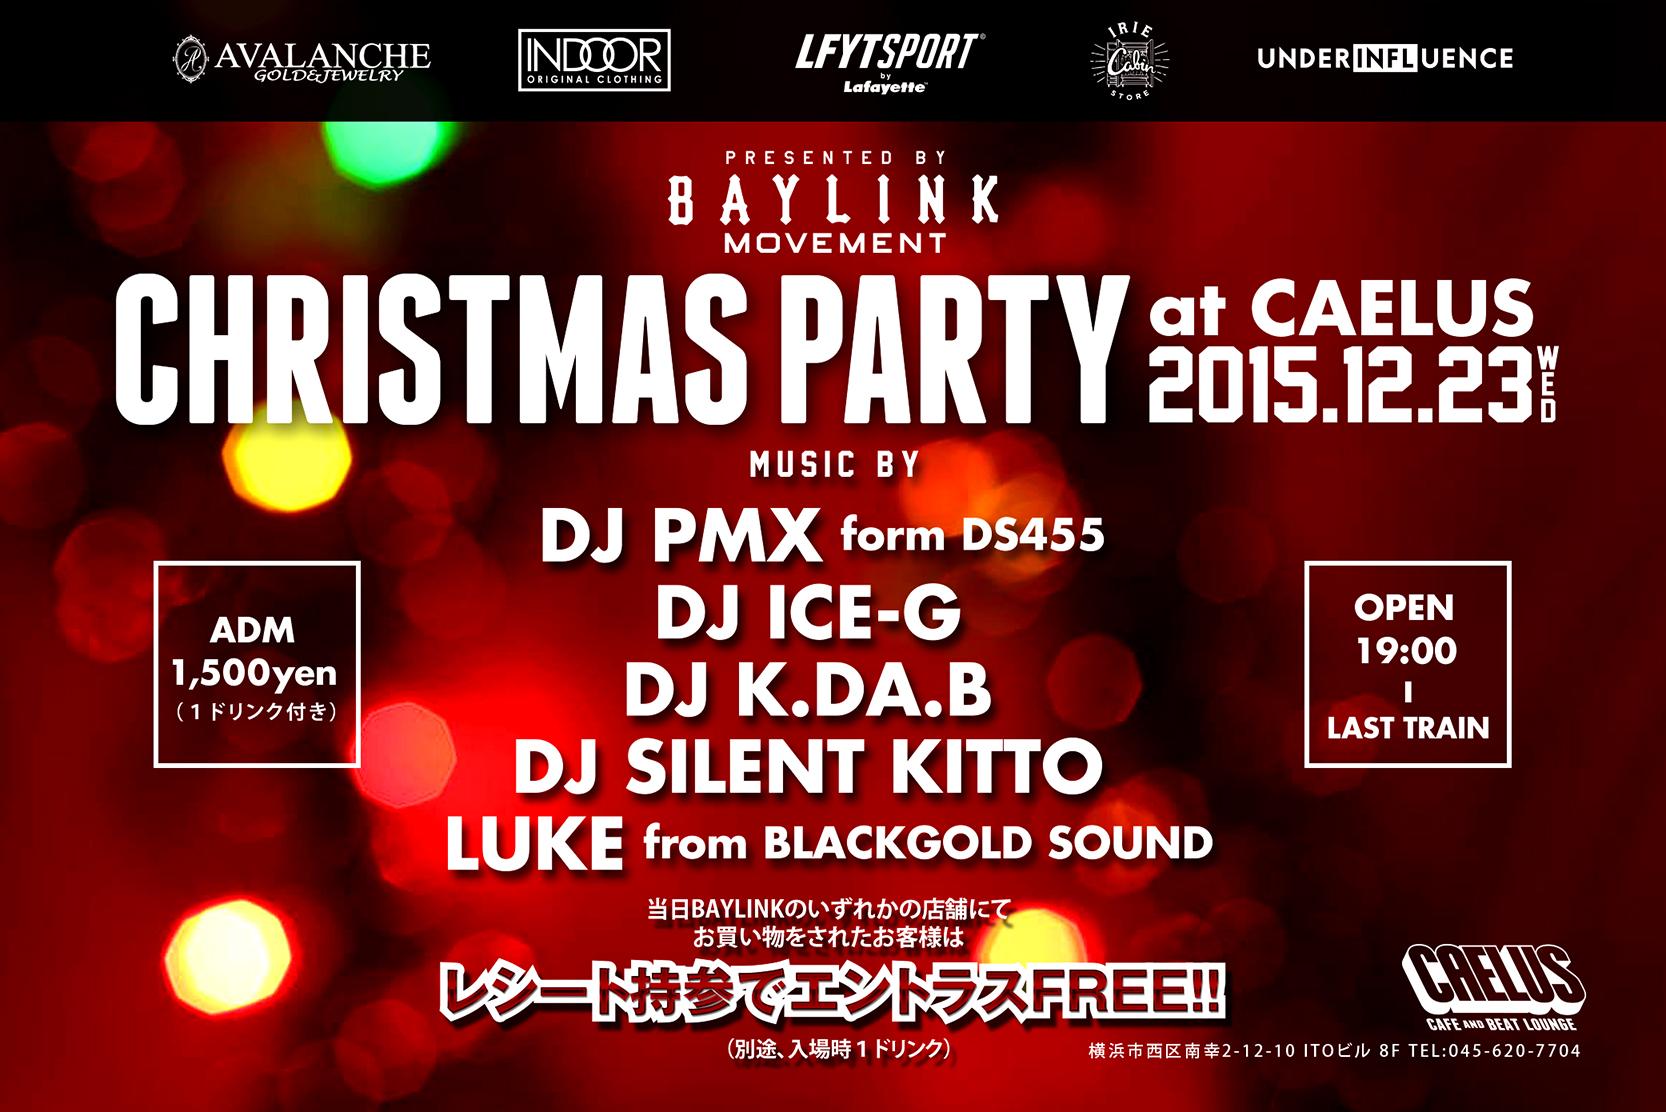 12月23日(水)「BAYLINK MOVEMNET PRESENTS CHRISTMAS PARTY」@神奈川県横浜市 CAELUS